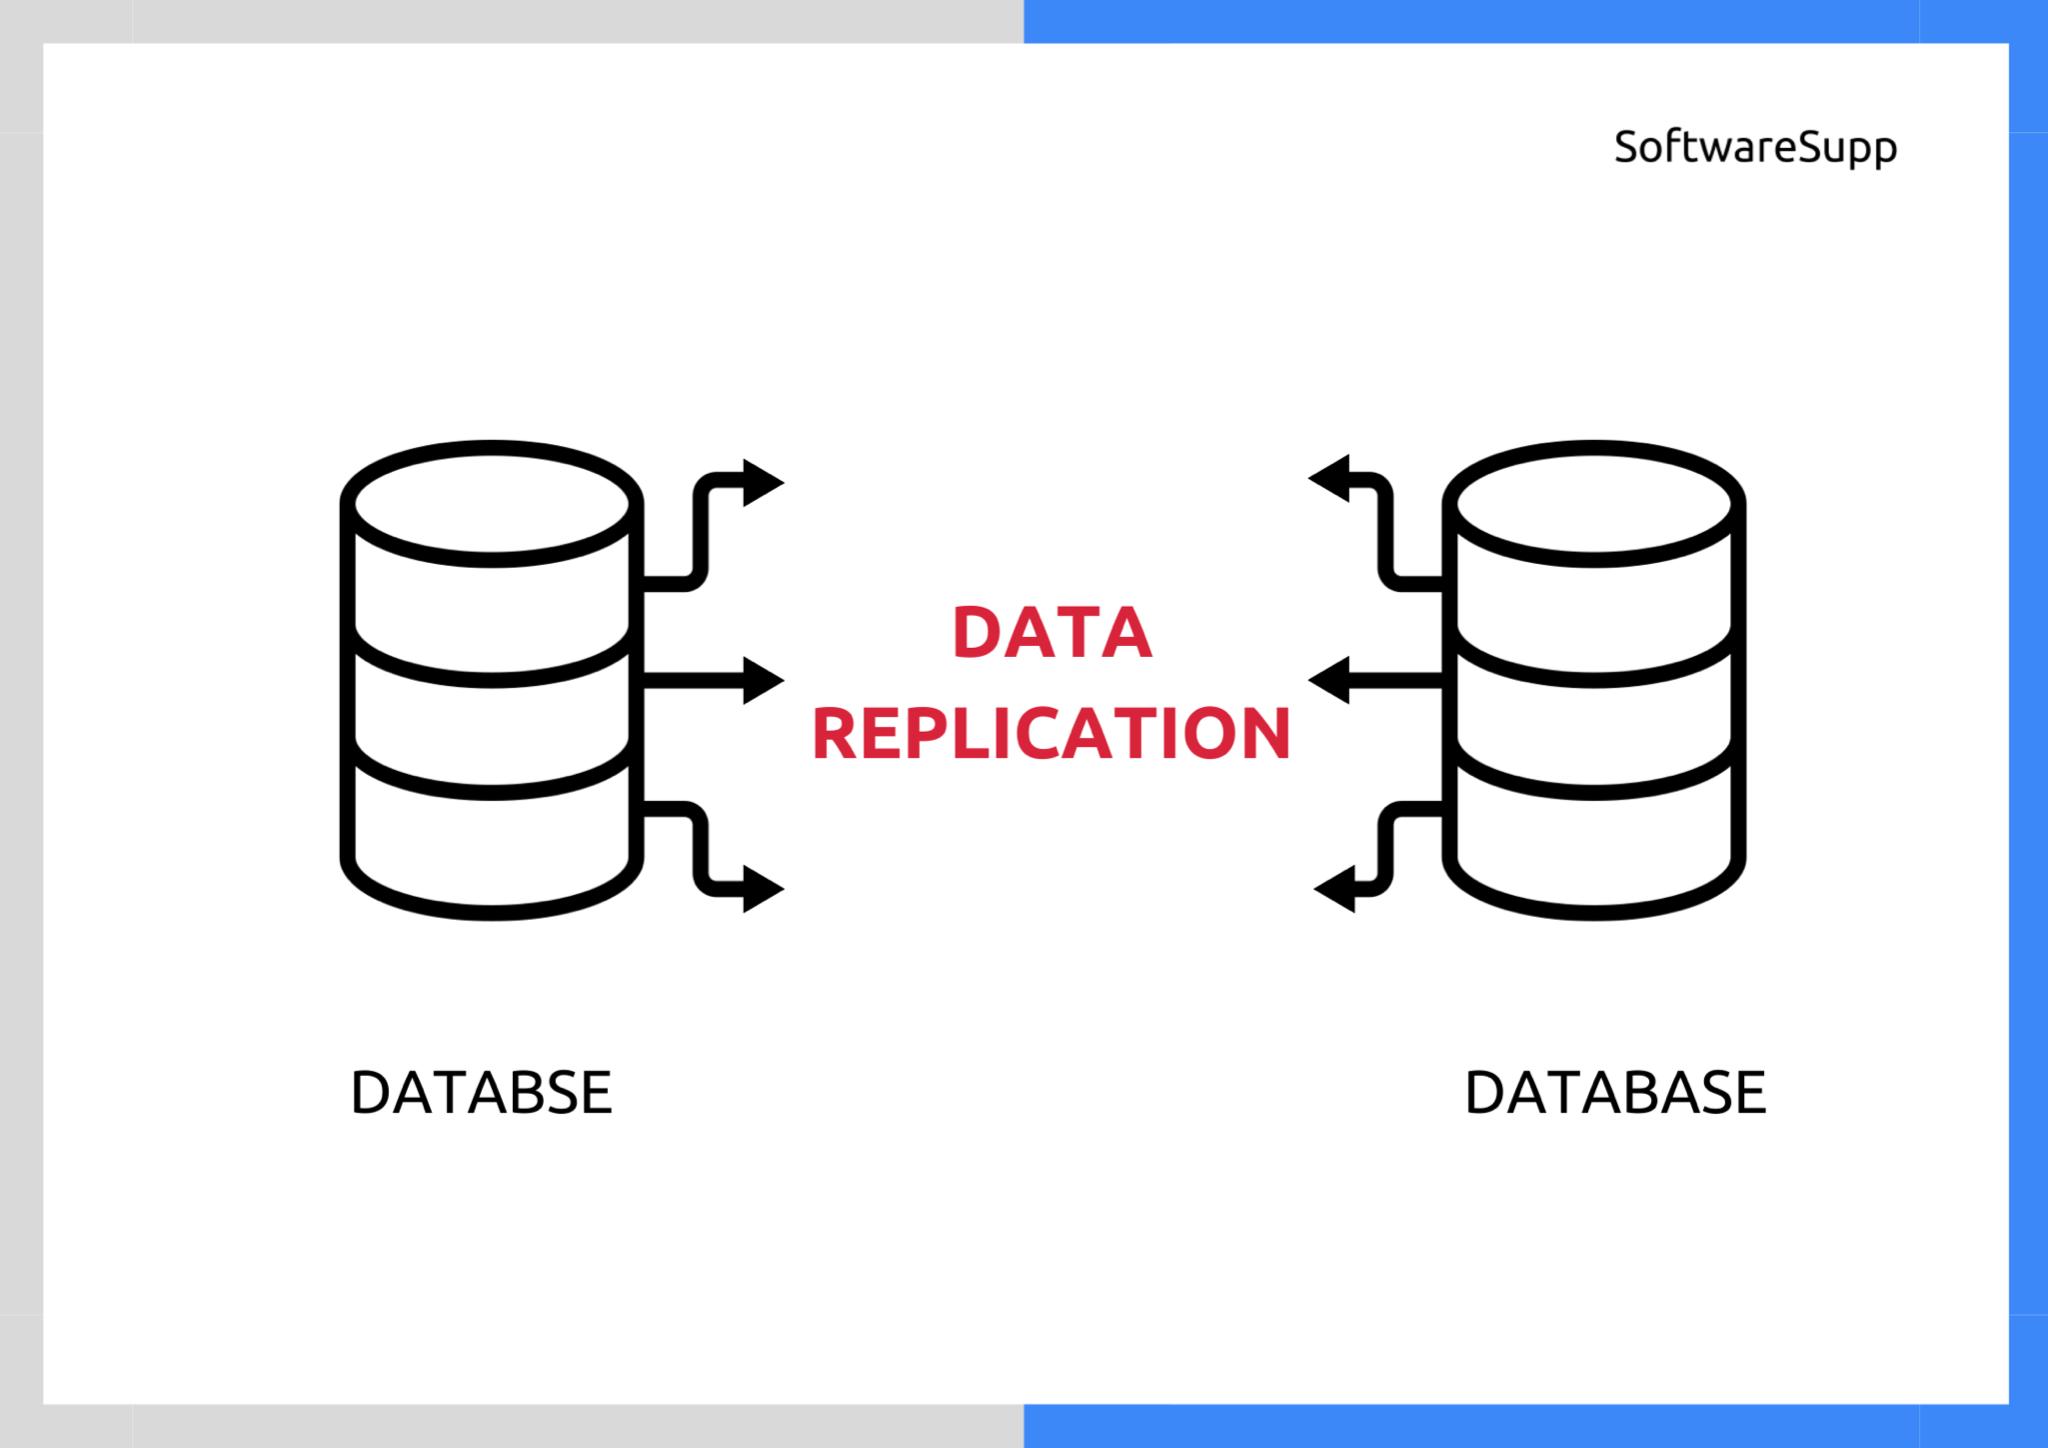 Schema of data replication